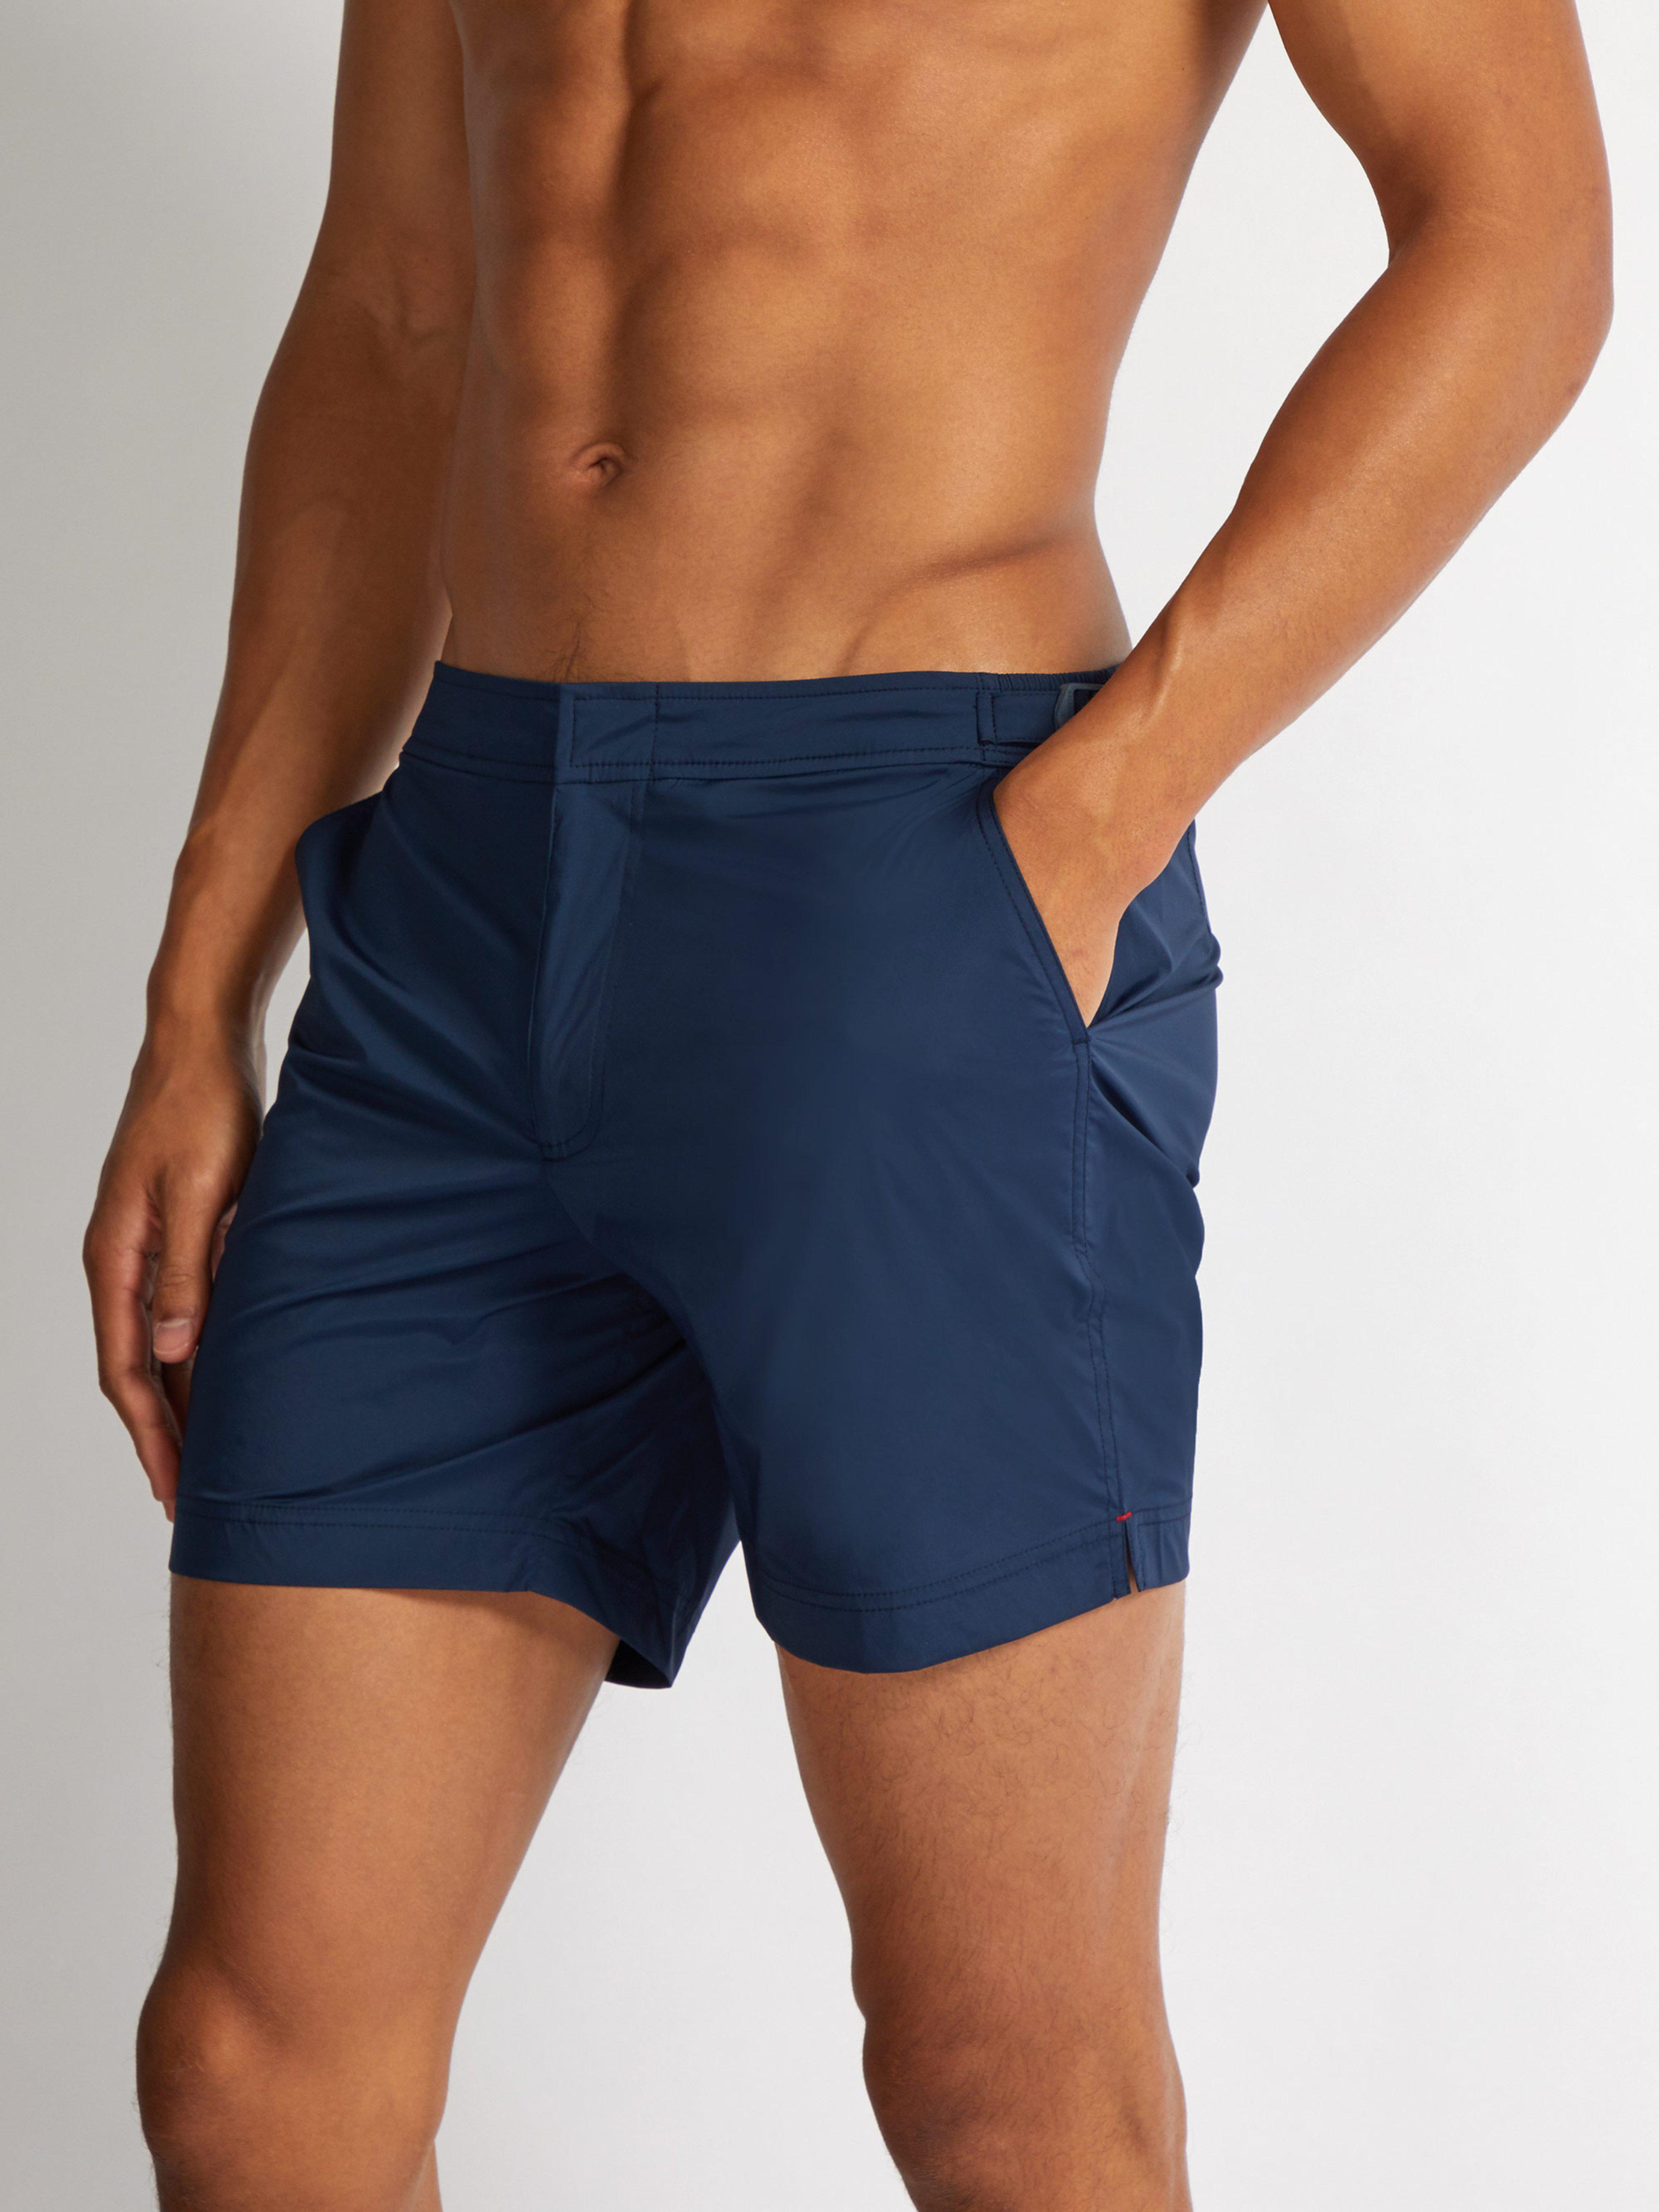 5f4b0444911a0 Orlebar Brown Bulldog Sport Swim Shorts in Blue for Men - Lyst